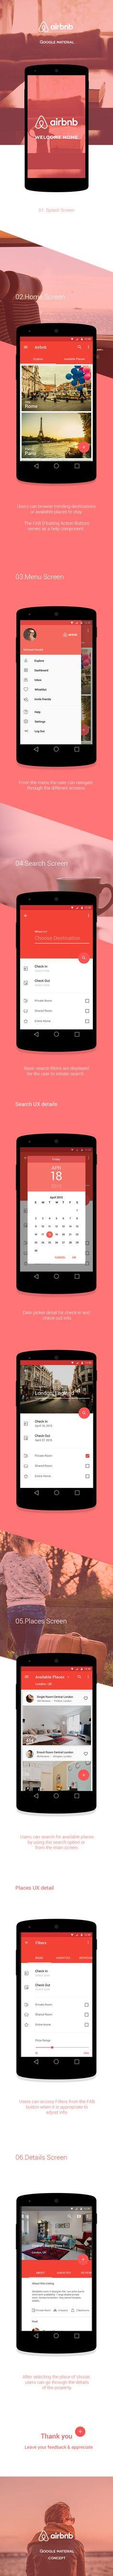 Airbnb - Google Material | Abduzeedo Design Inspiration